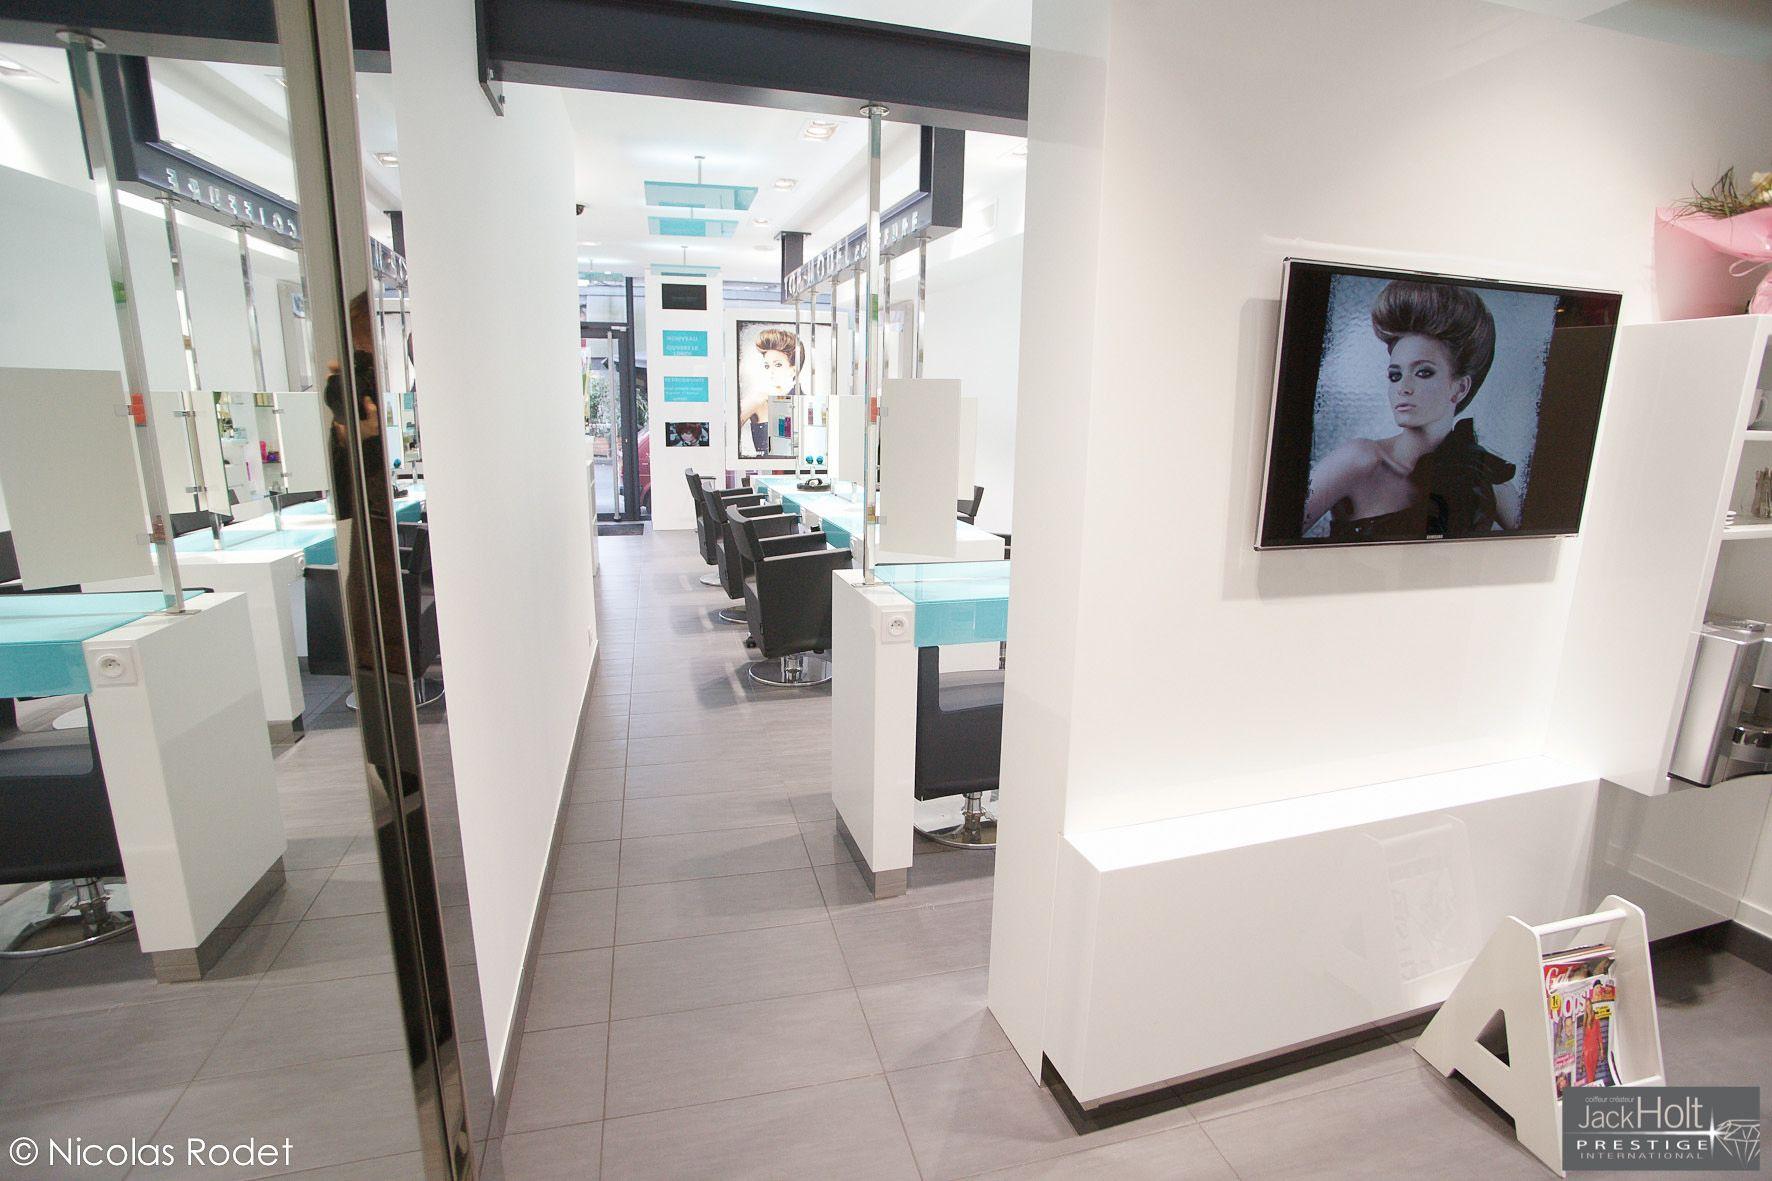 28++ Salon de coiffure lyon le dernier